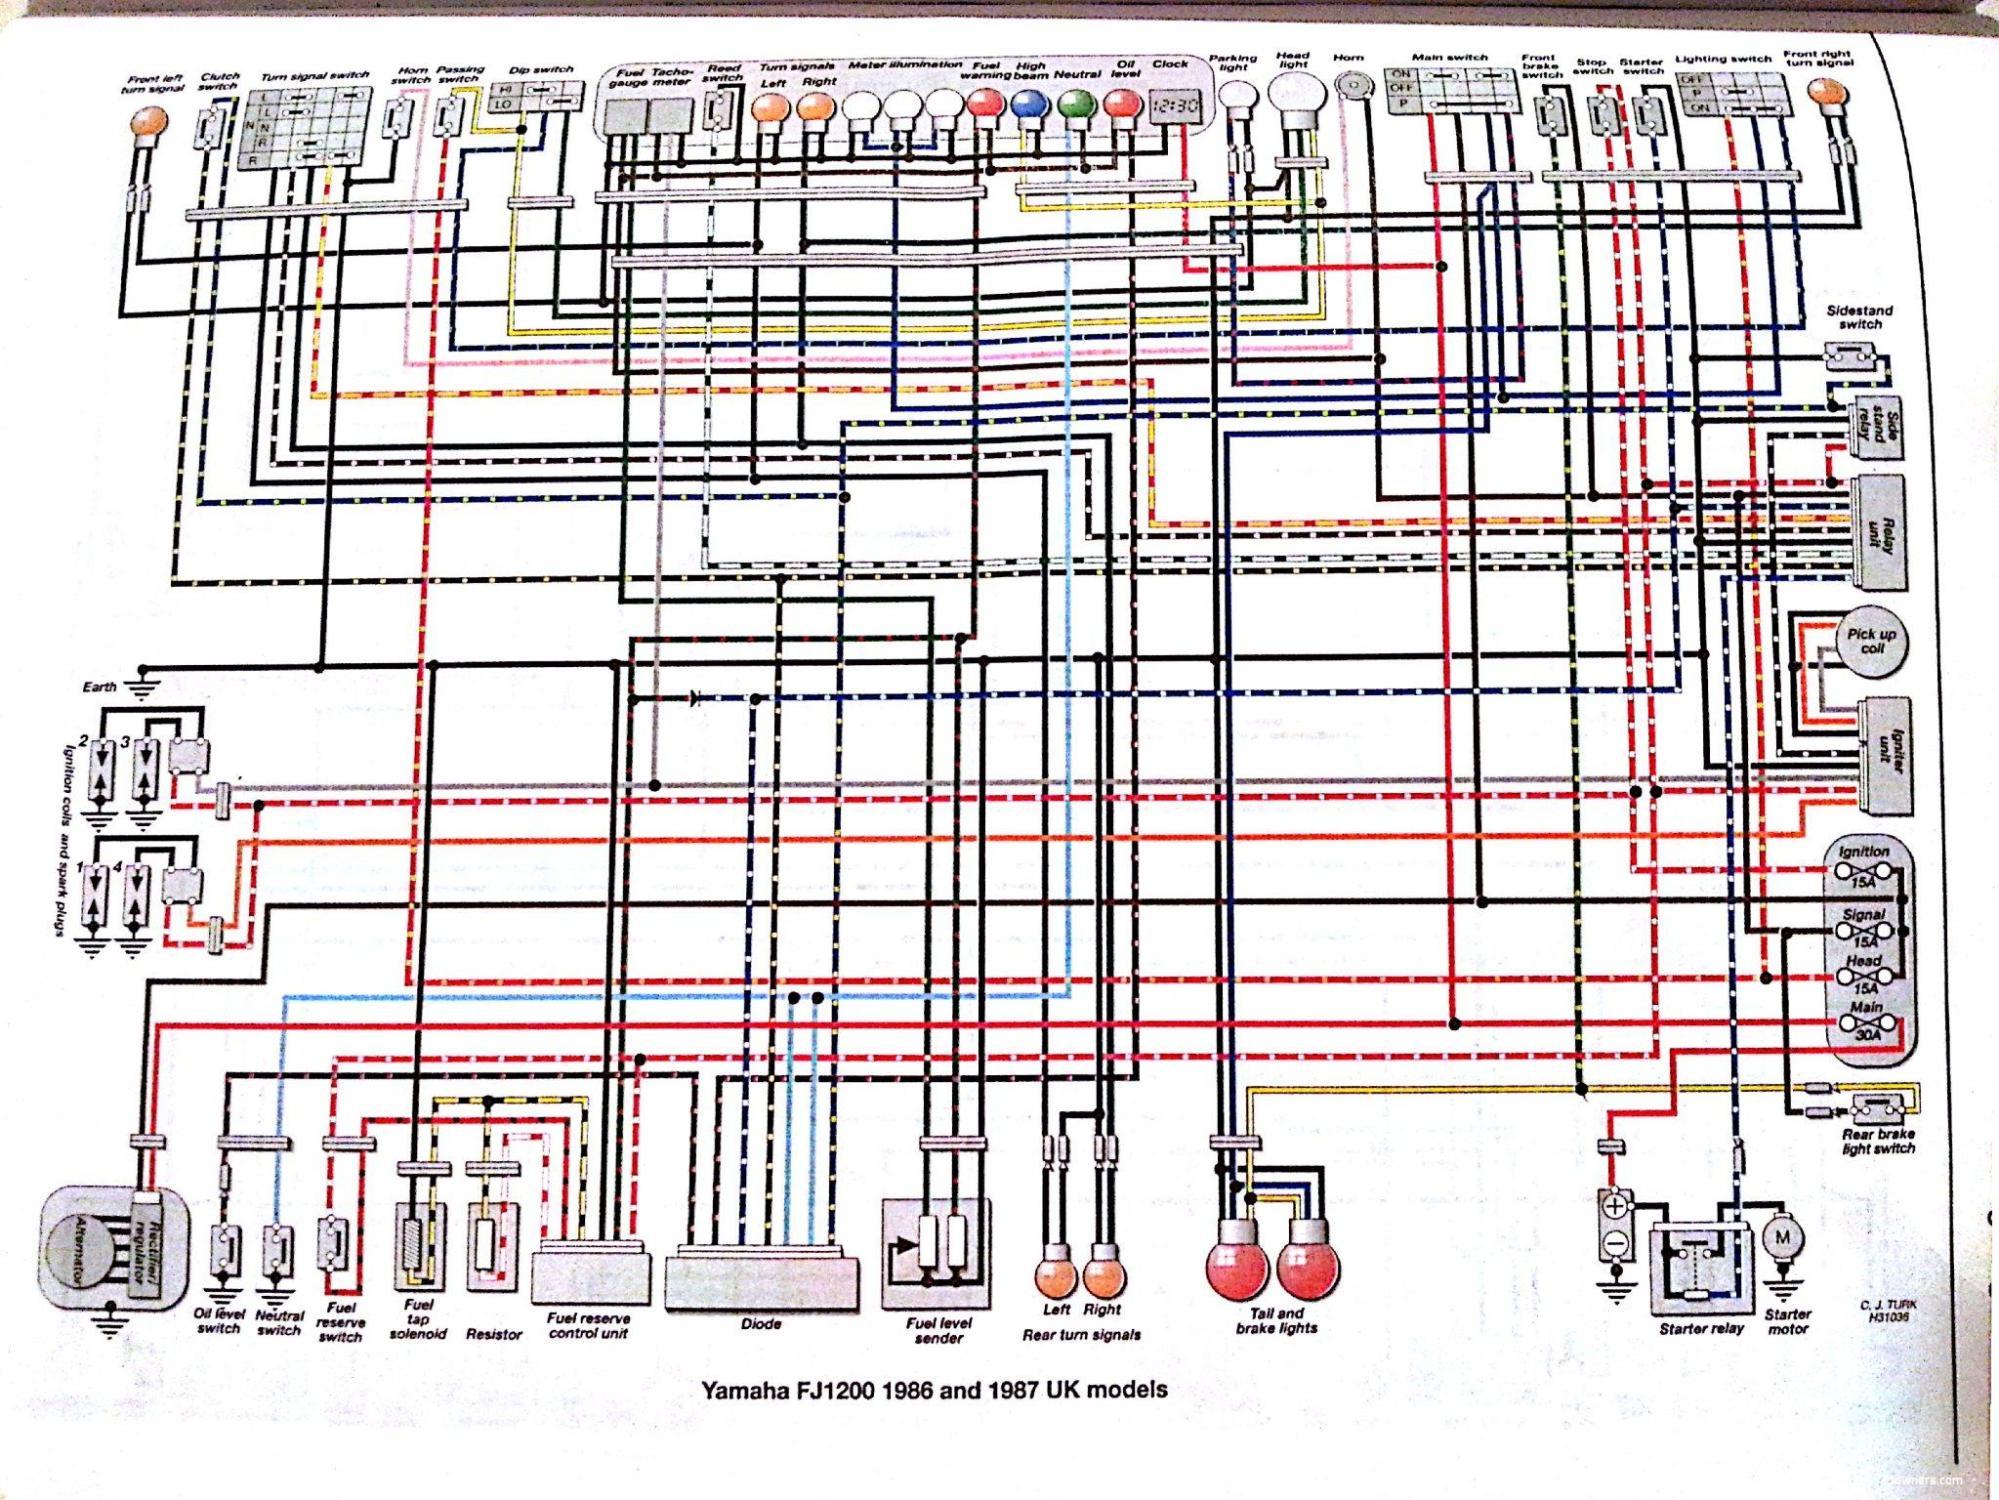 hight resolution of any good turnsignal mod mounting points yamaha fj1200 wiring diagram